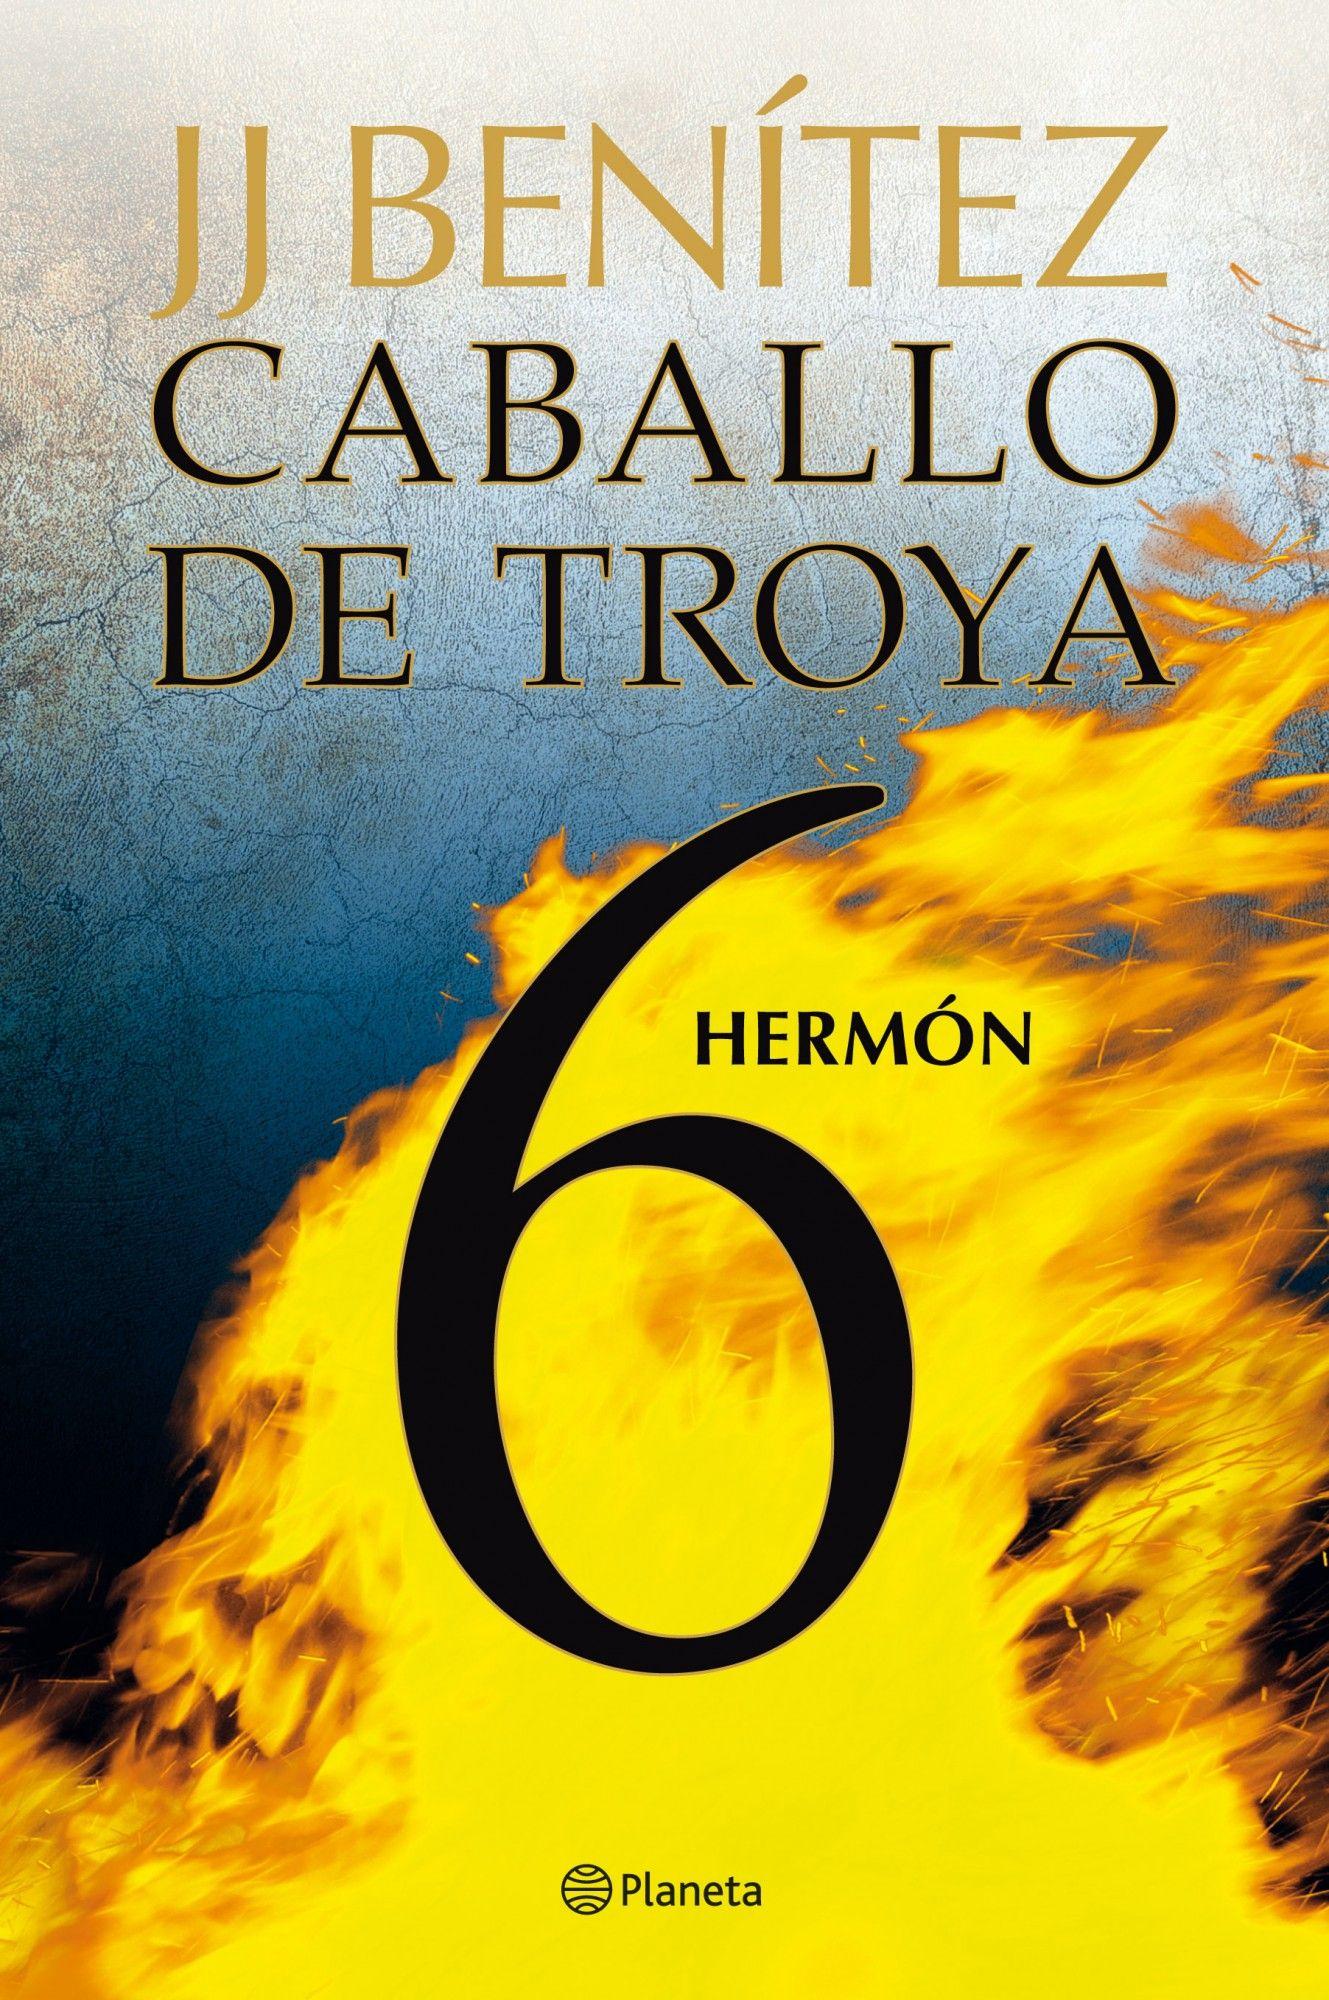 Caballo De Troya 6 Hermon J J Benitez Caballo De Troya Libros